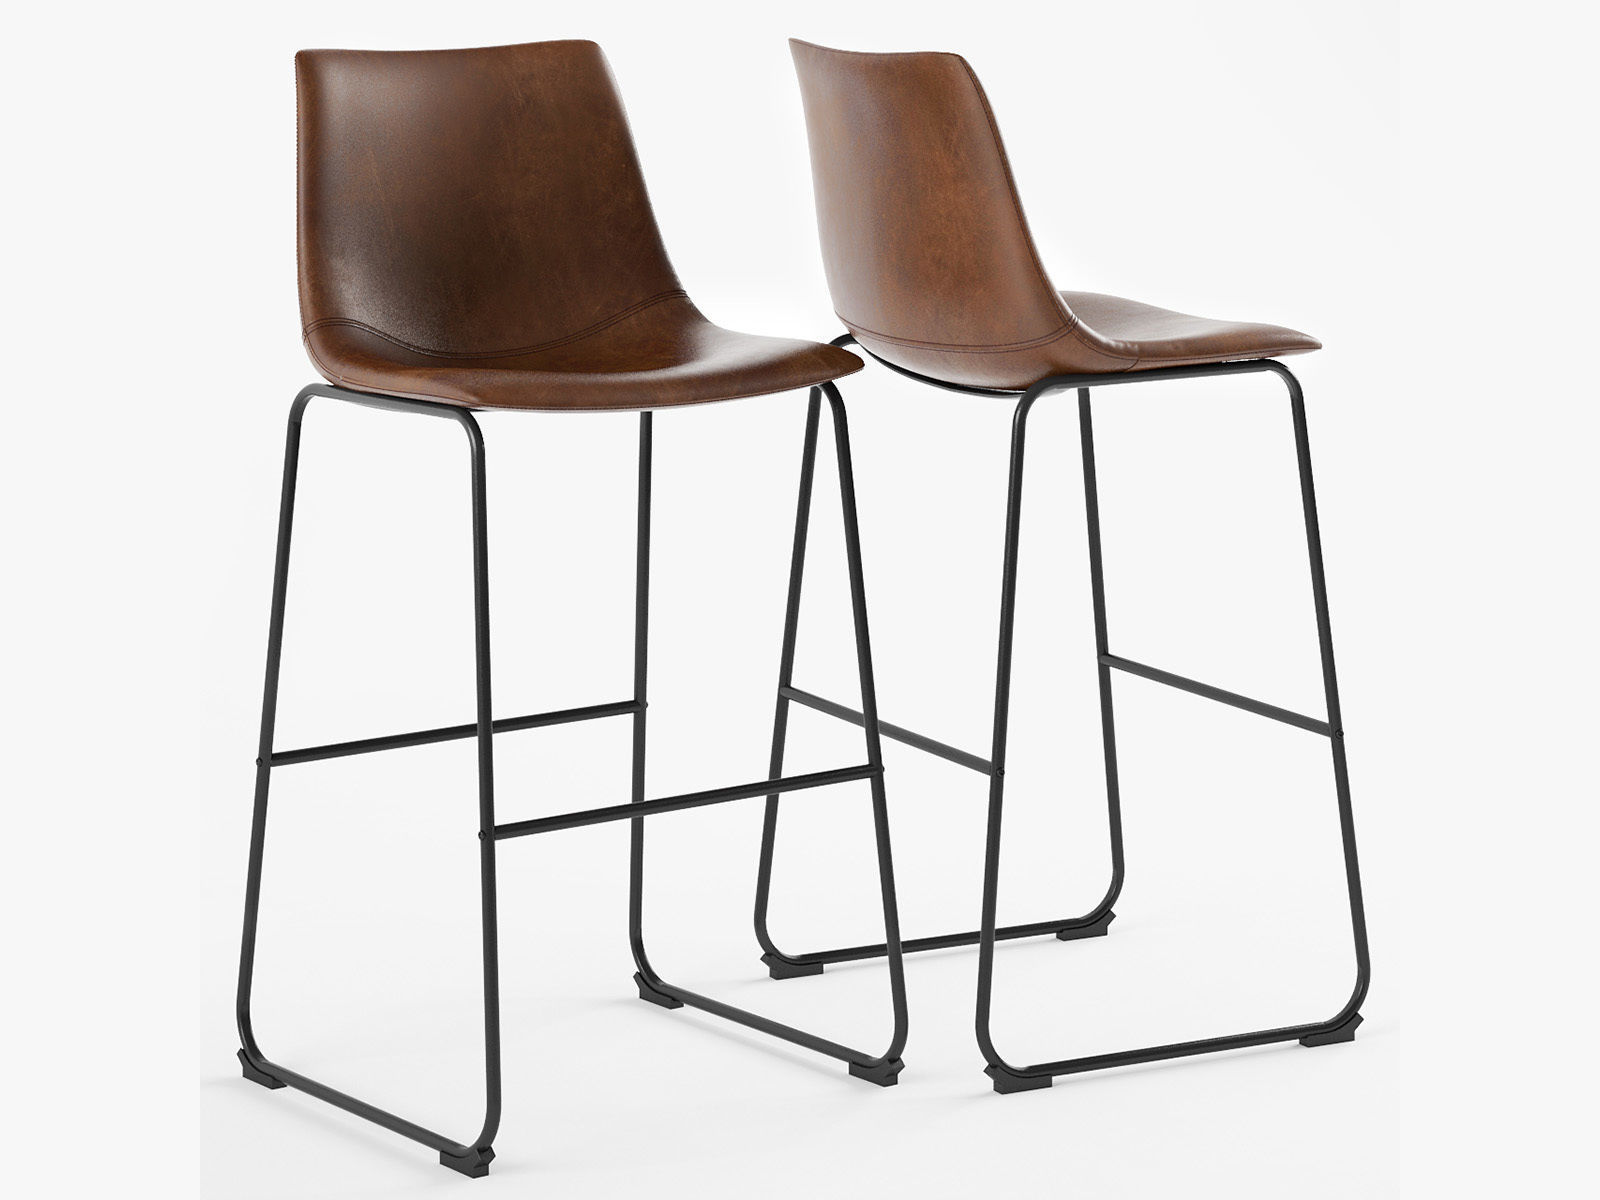 Fantastic Centiar Adan Bar Stool 3D Model Beatyapartments Chair Design Images Beatyapartmentscom